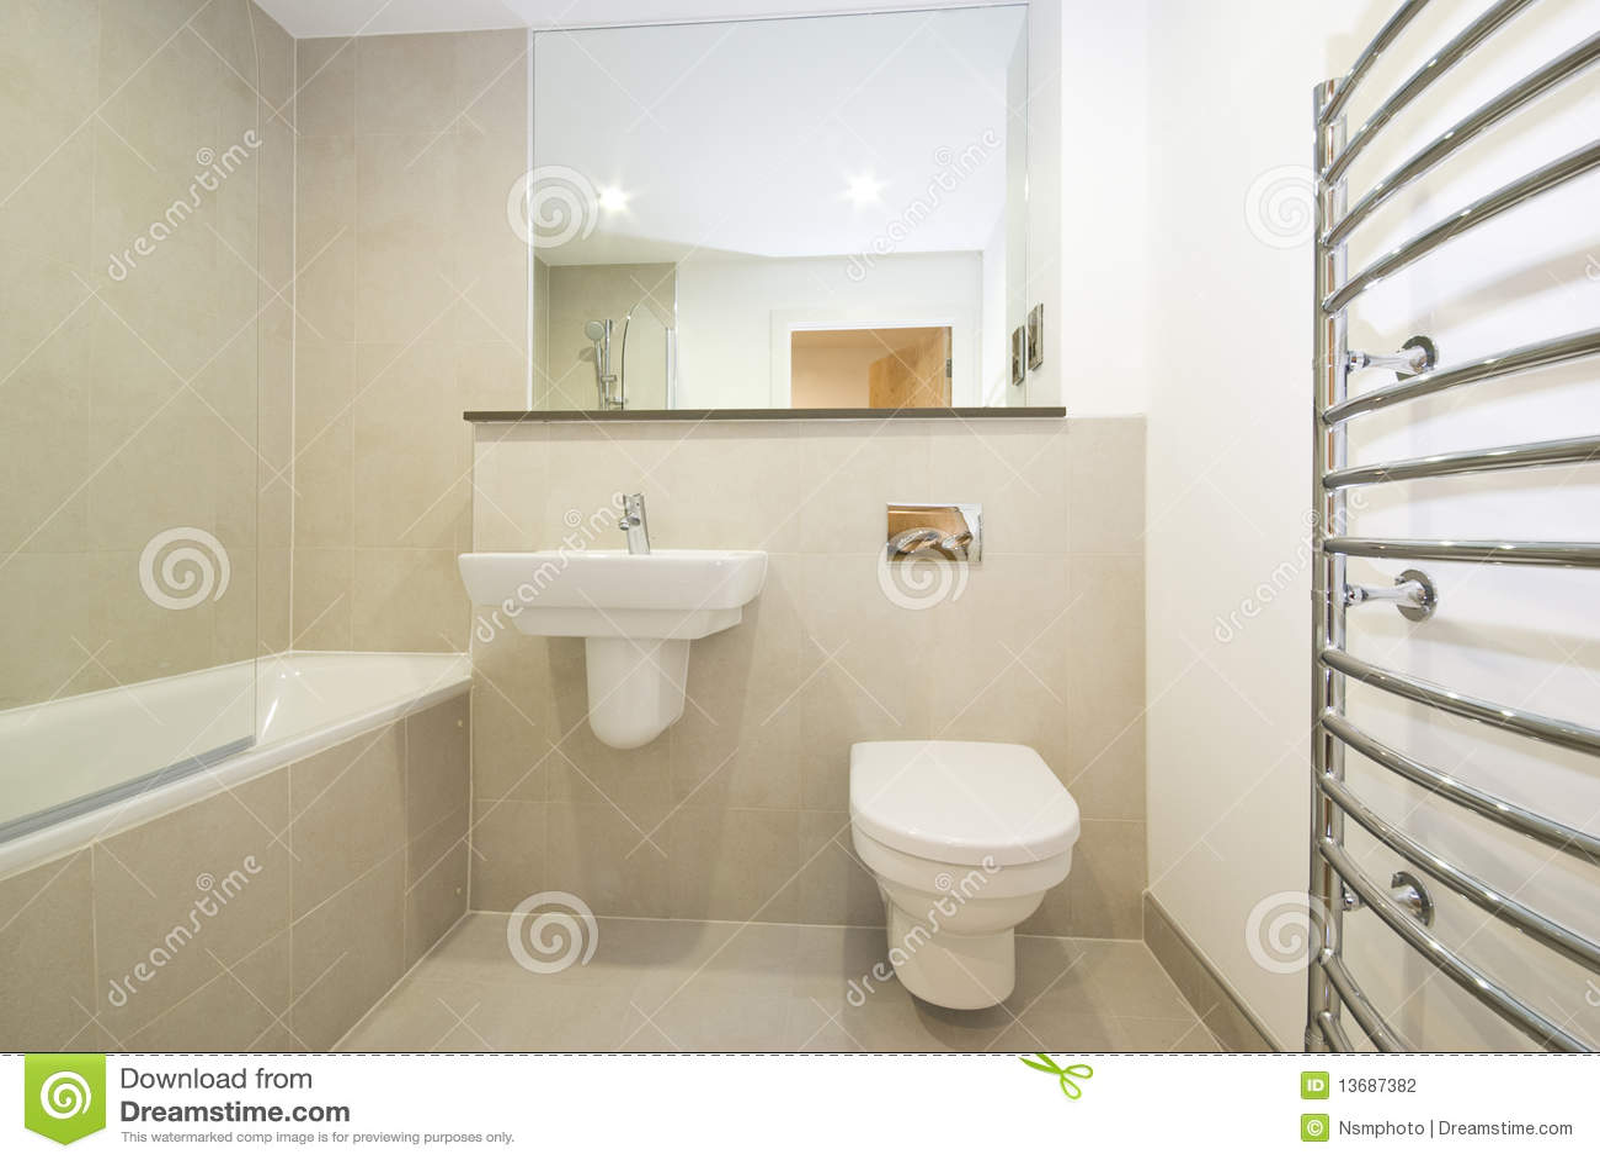 salle de bain moderne beige - Salle De Bain Moderne Beige